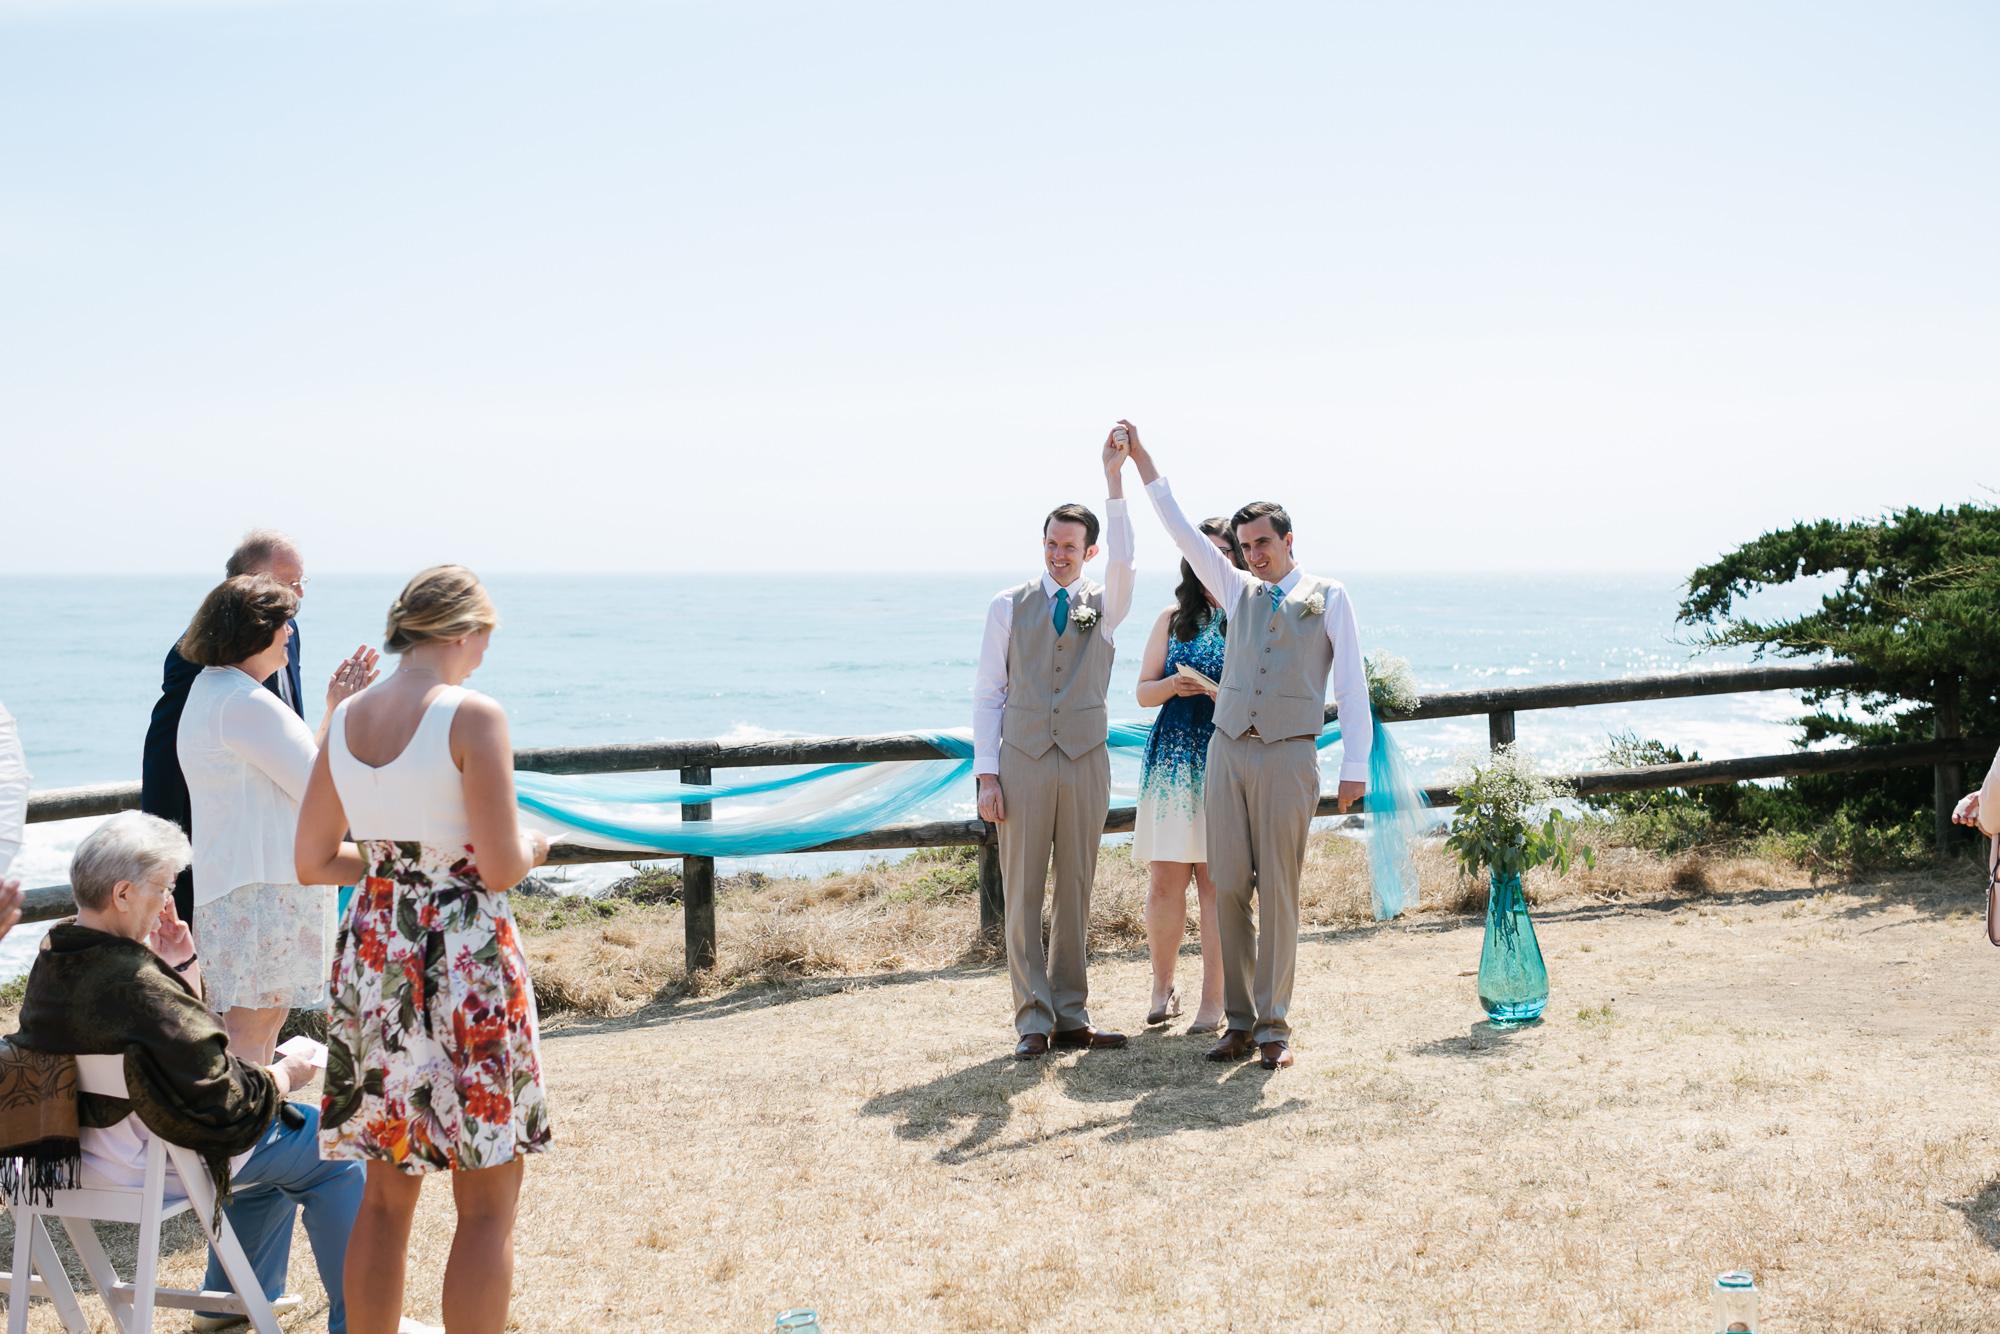 19_Cambria_wedding_samesex_coastal_intimate_Central_Coast_beach.jpg